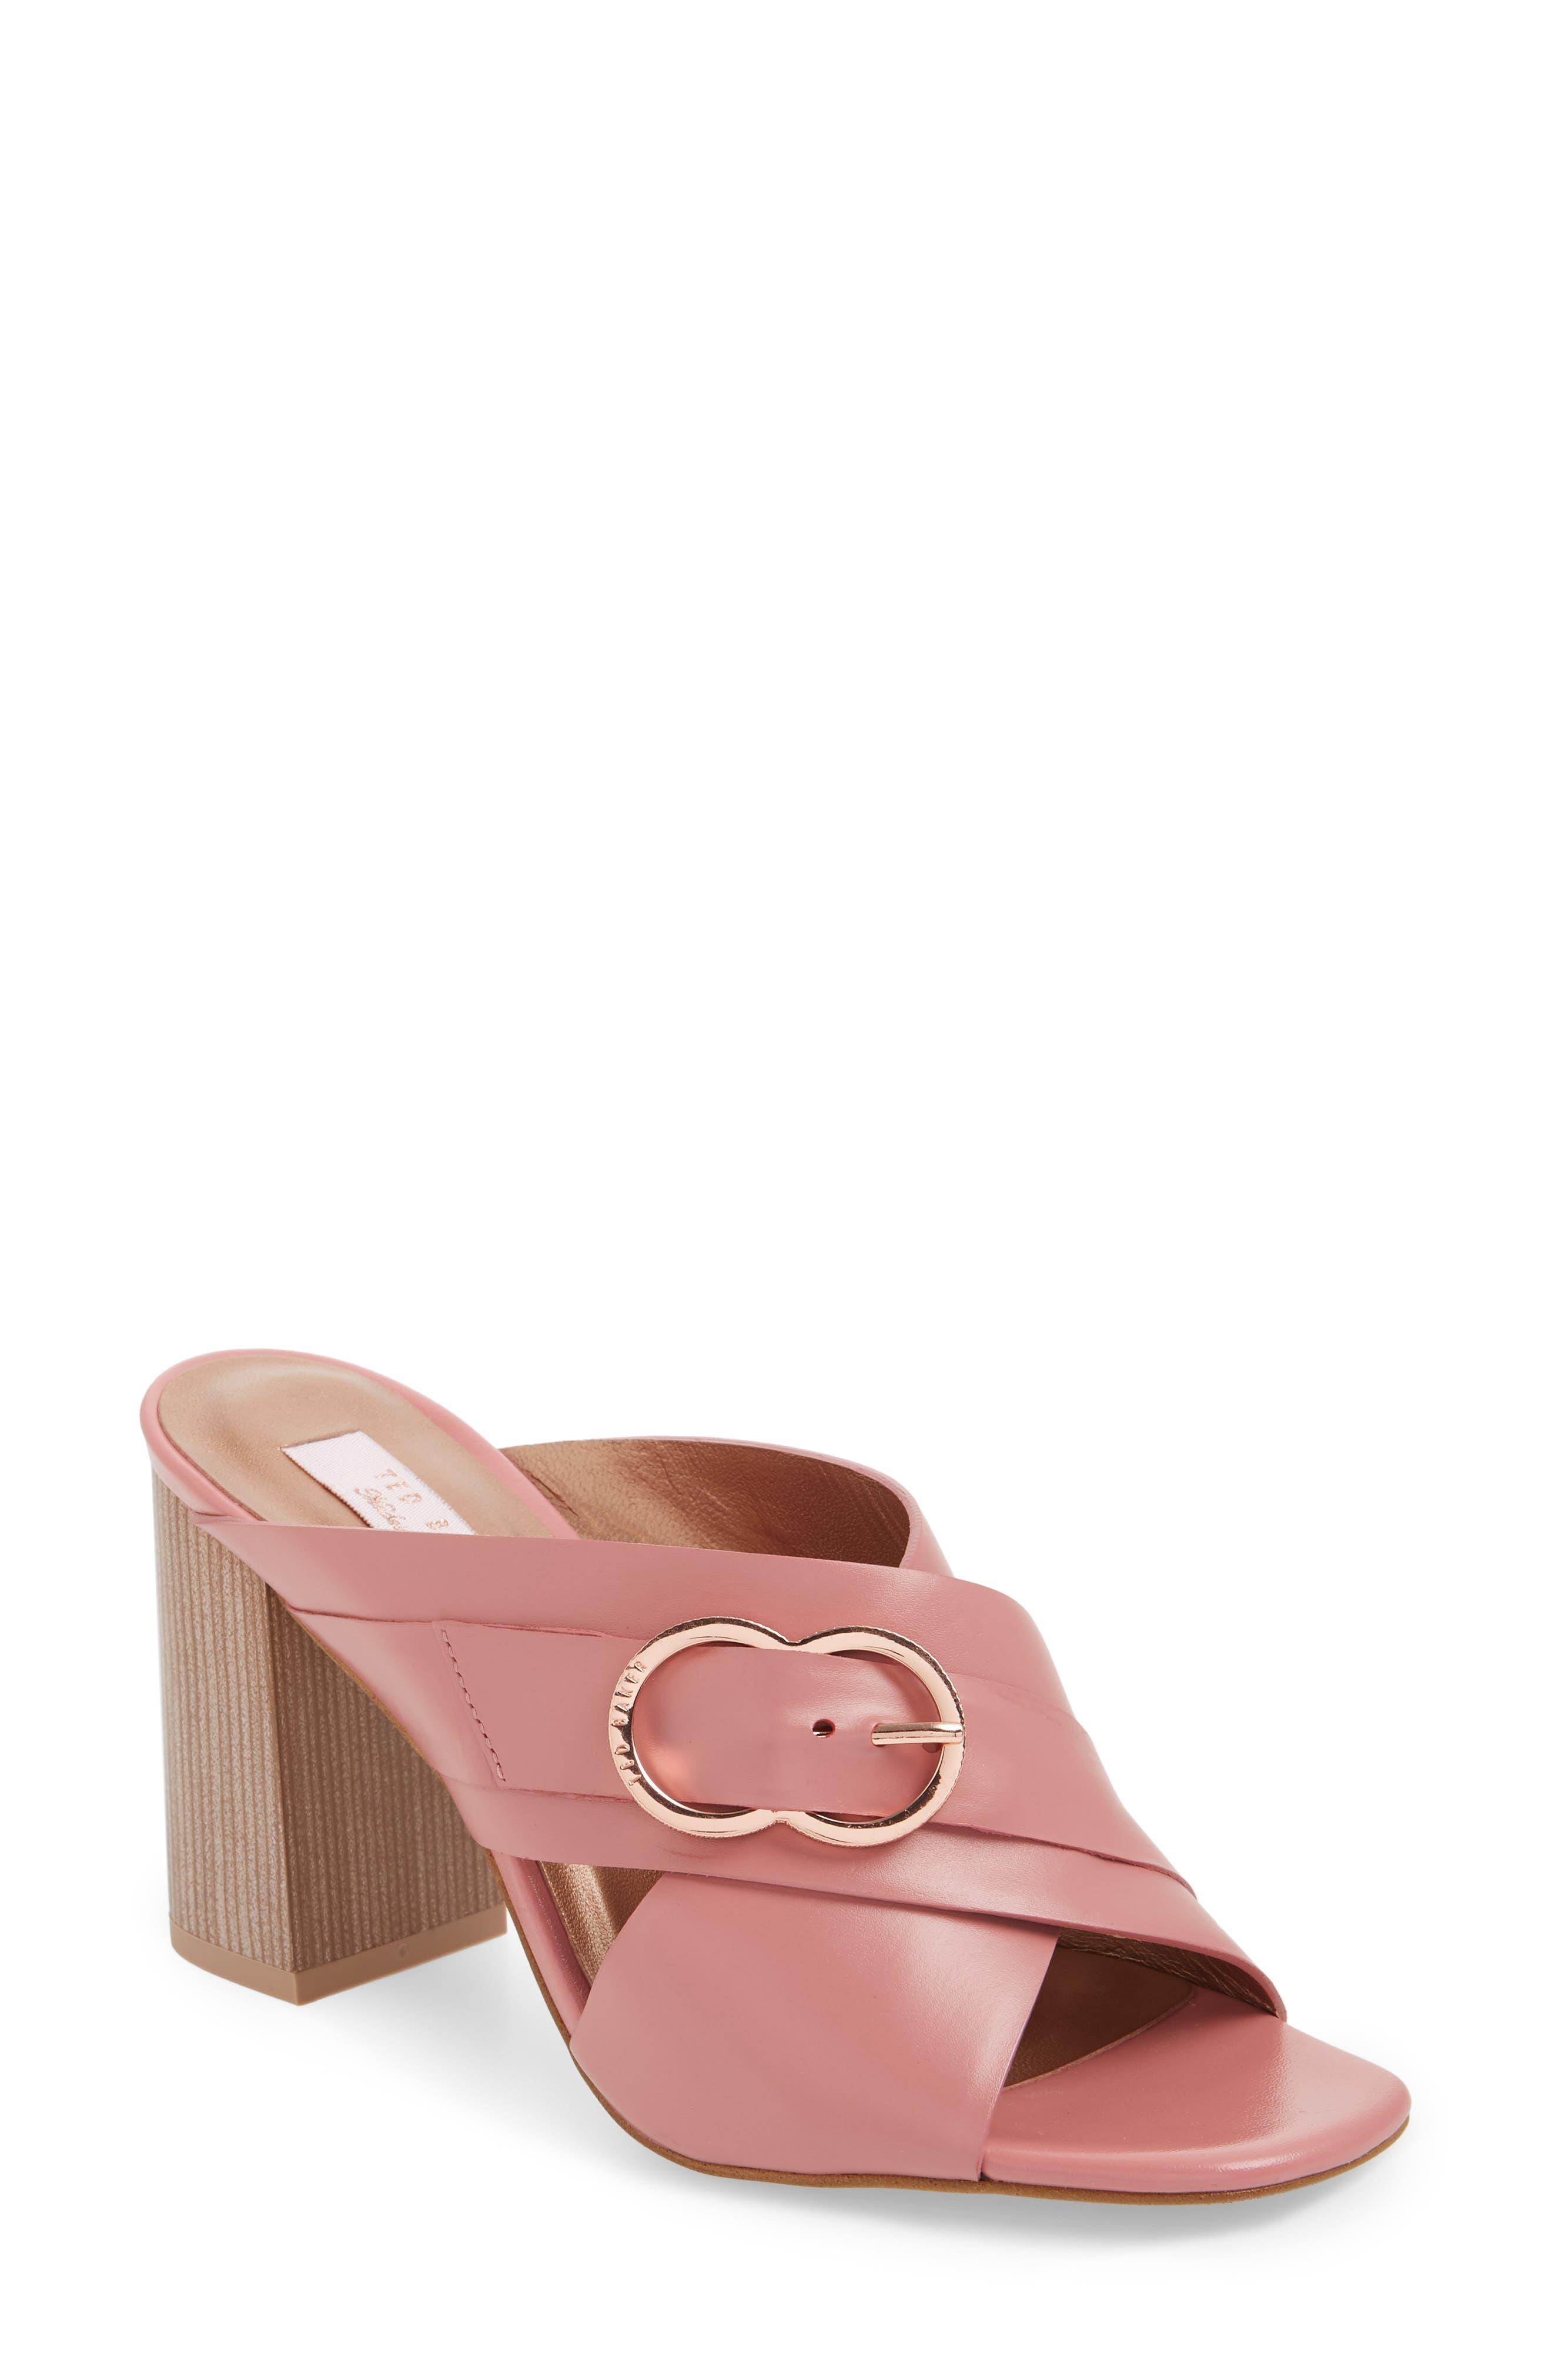 Malada Slide Sandal,                         Main,                         color, Pink Leather